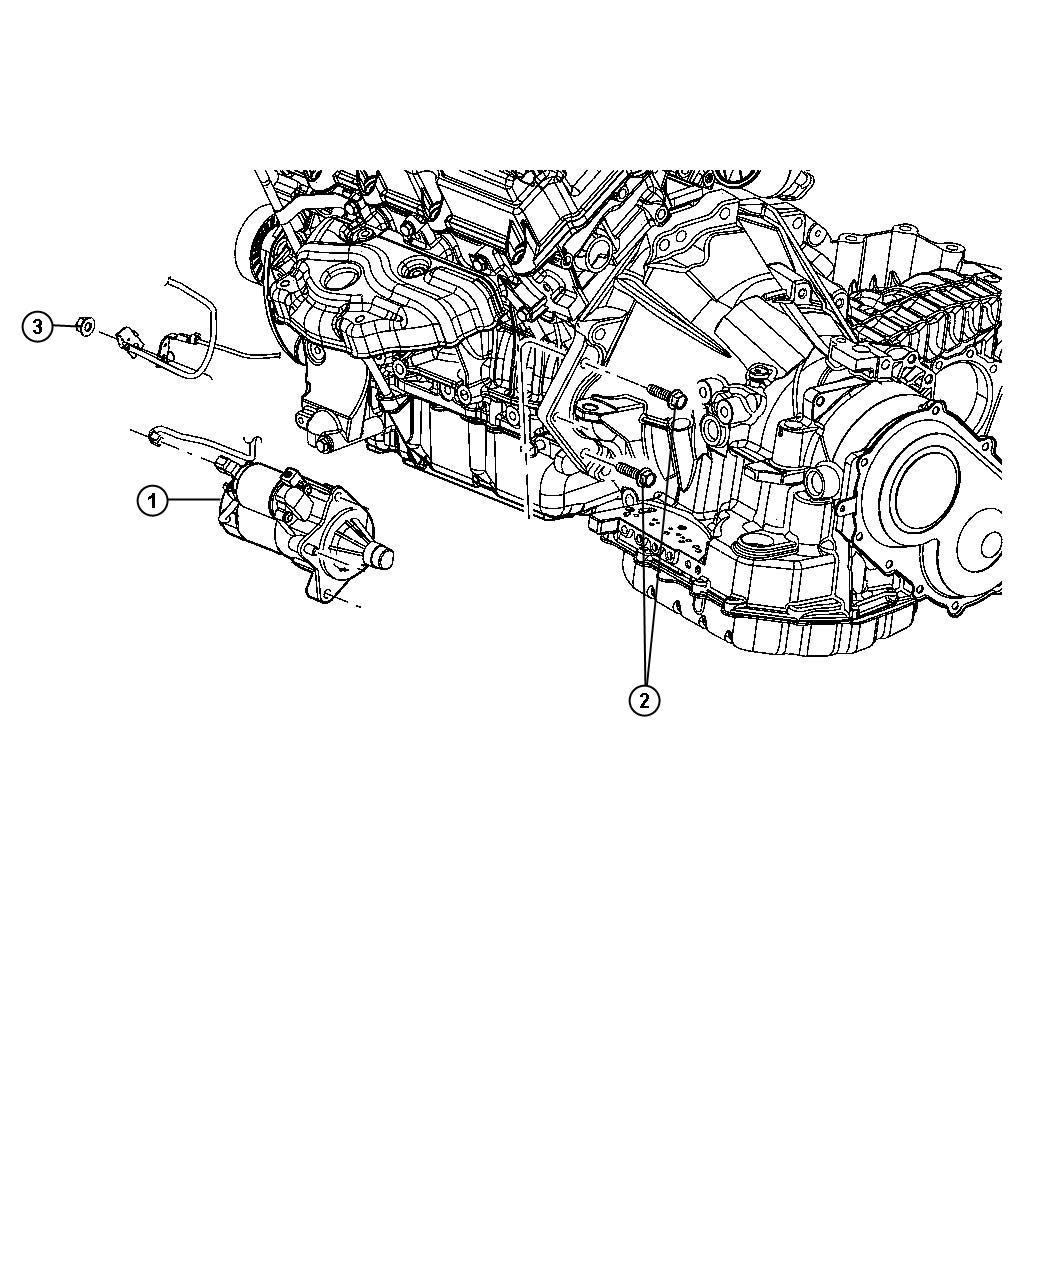 Chrysler Sebring Starter Engine Remanufactured Power